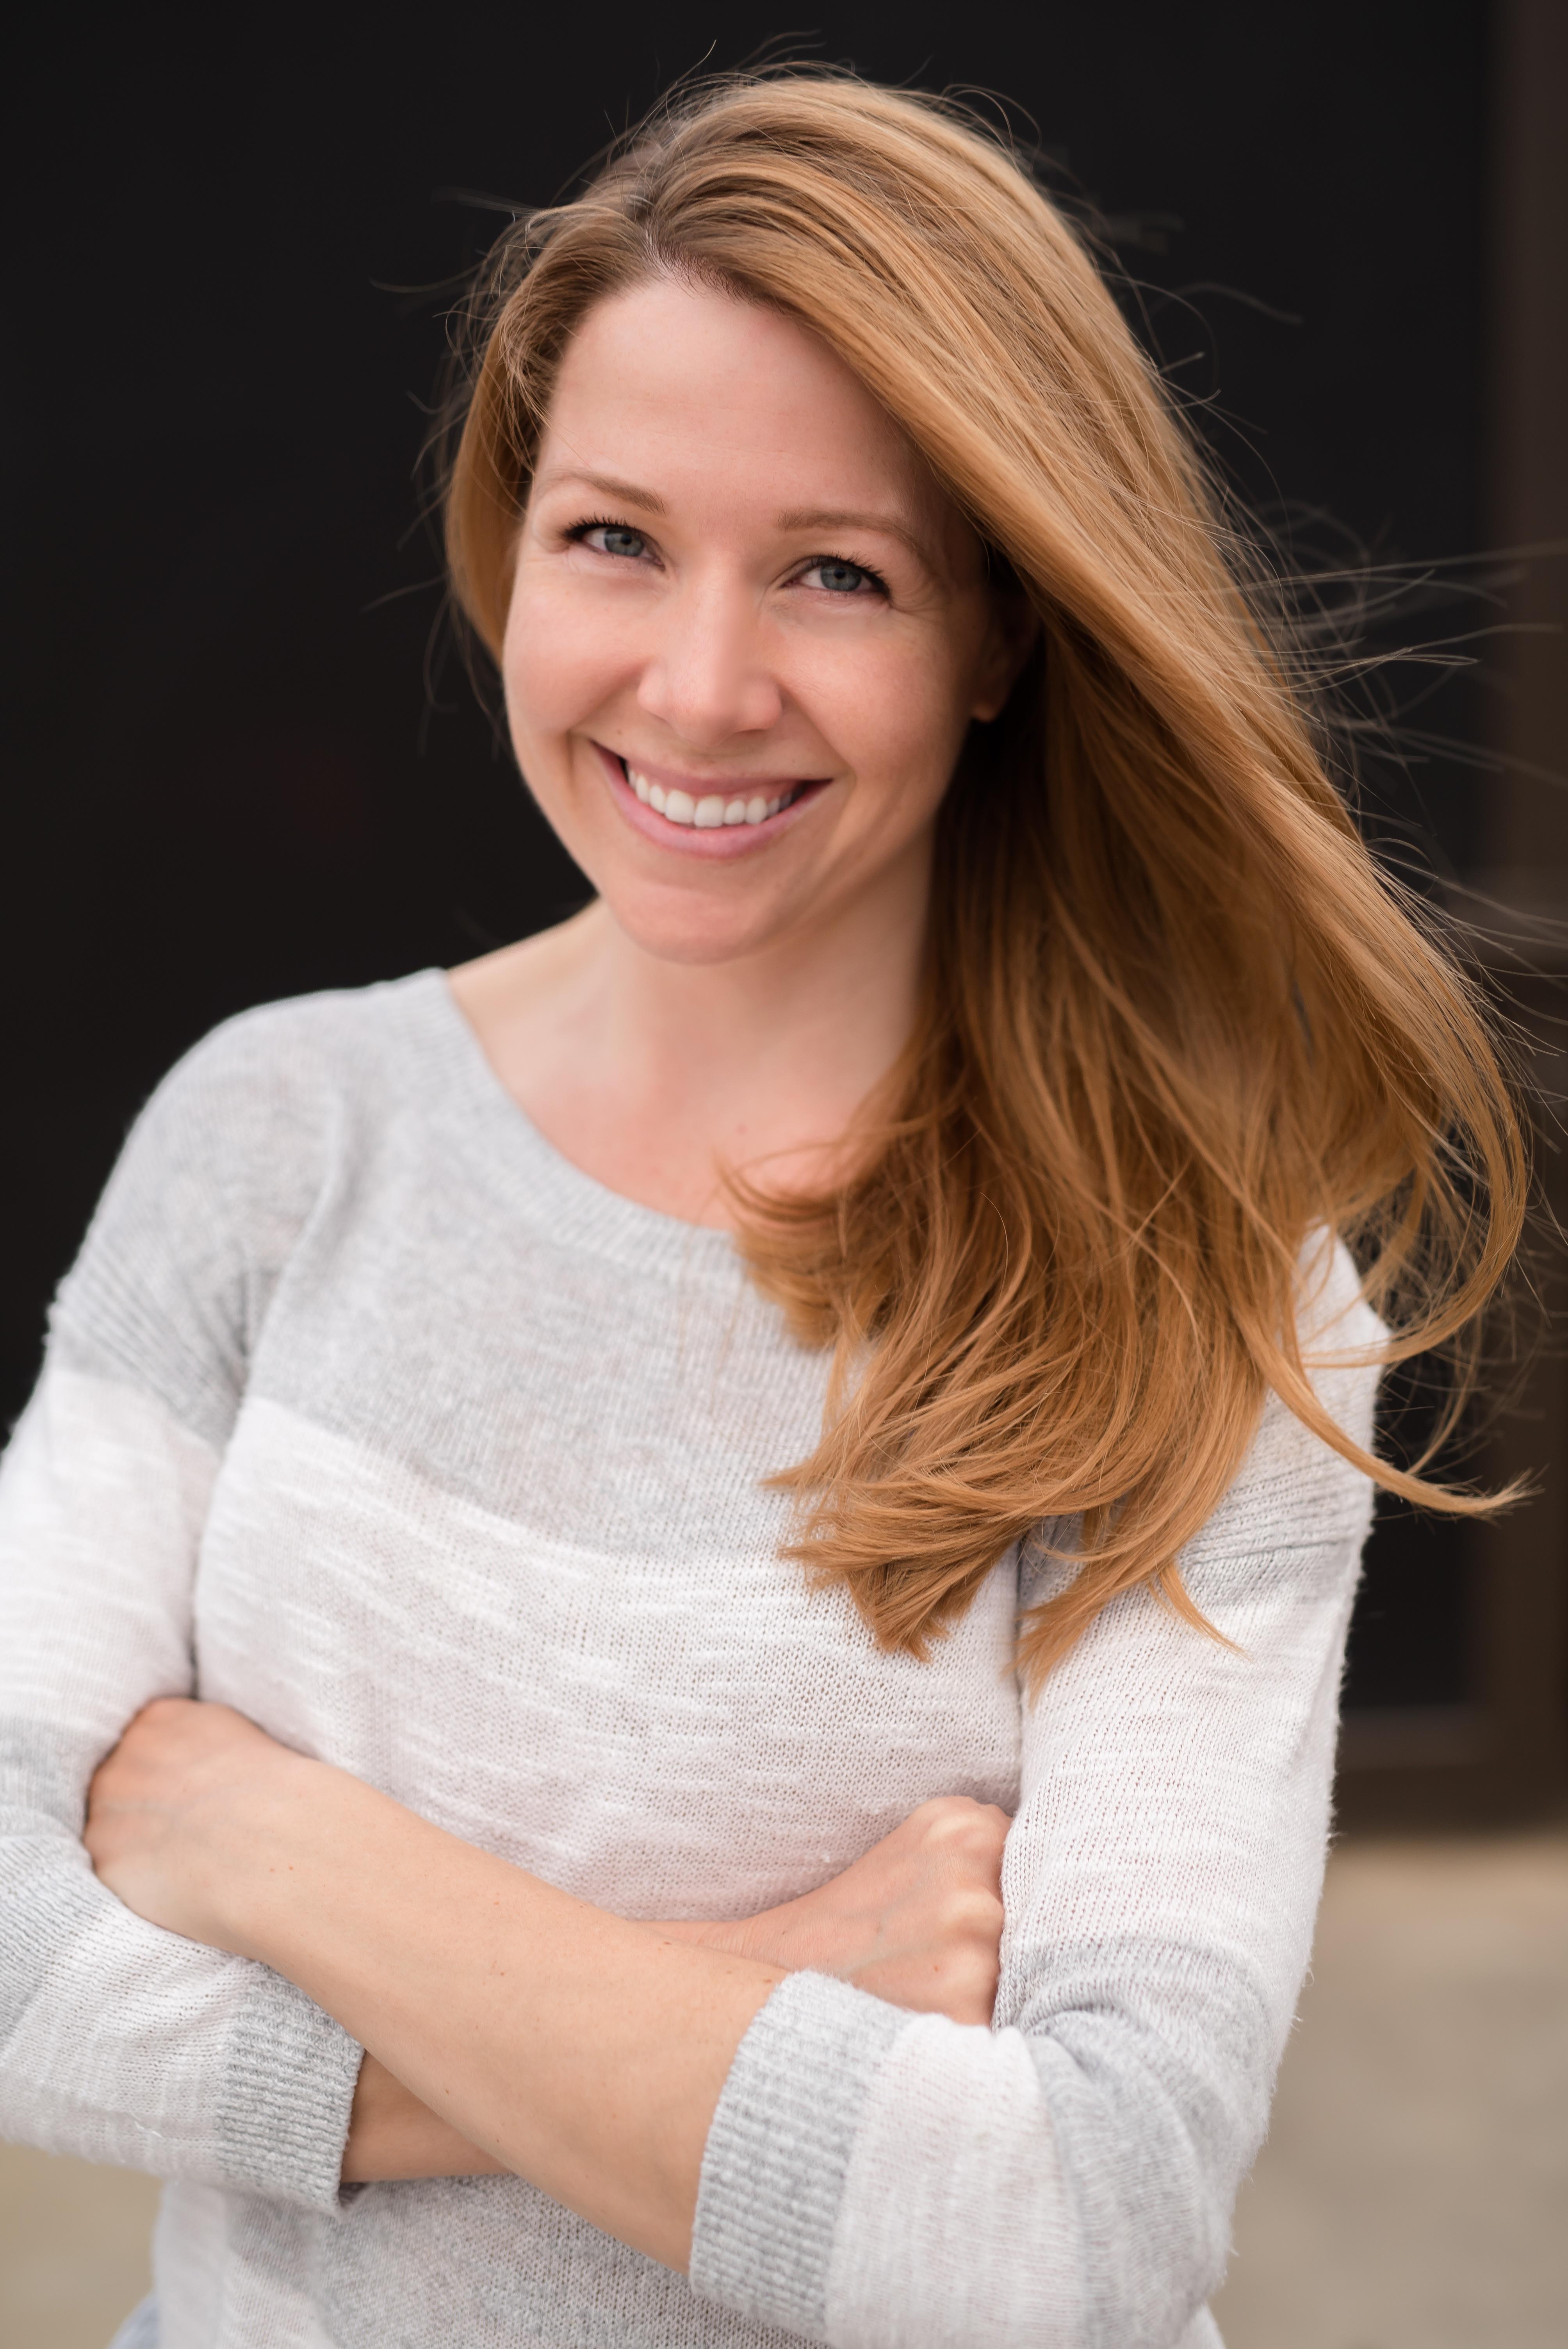 Lisa Pinnell